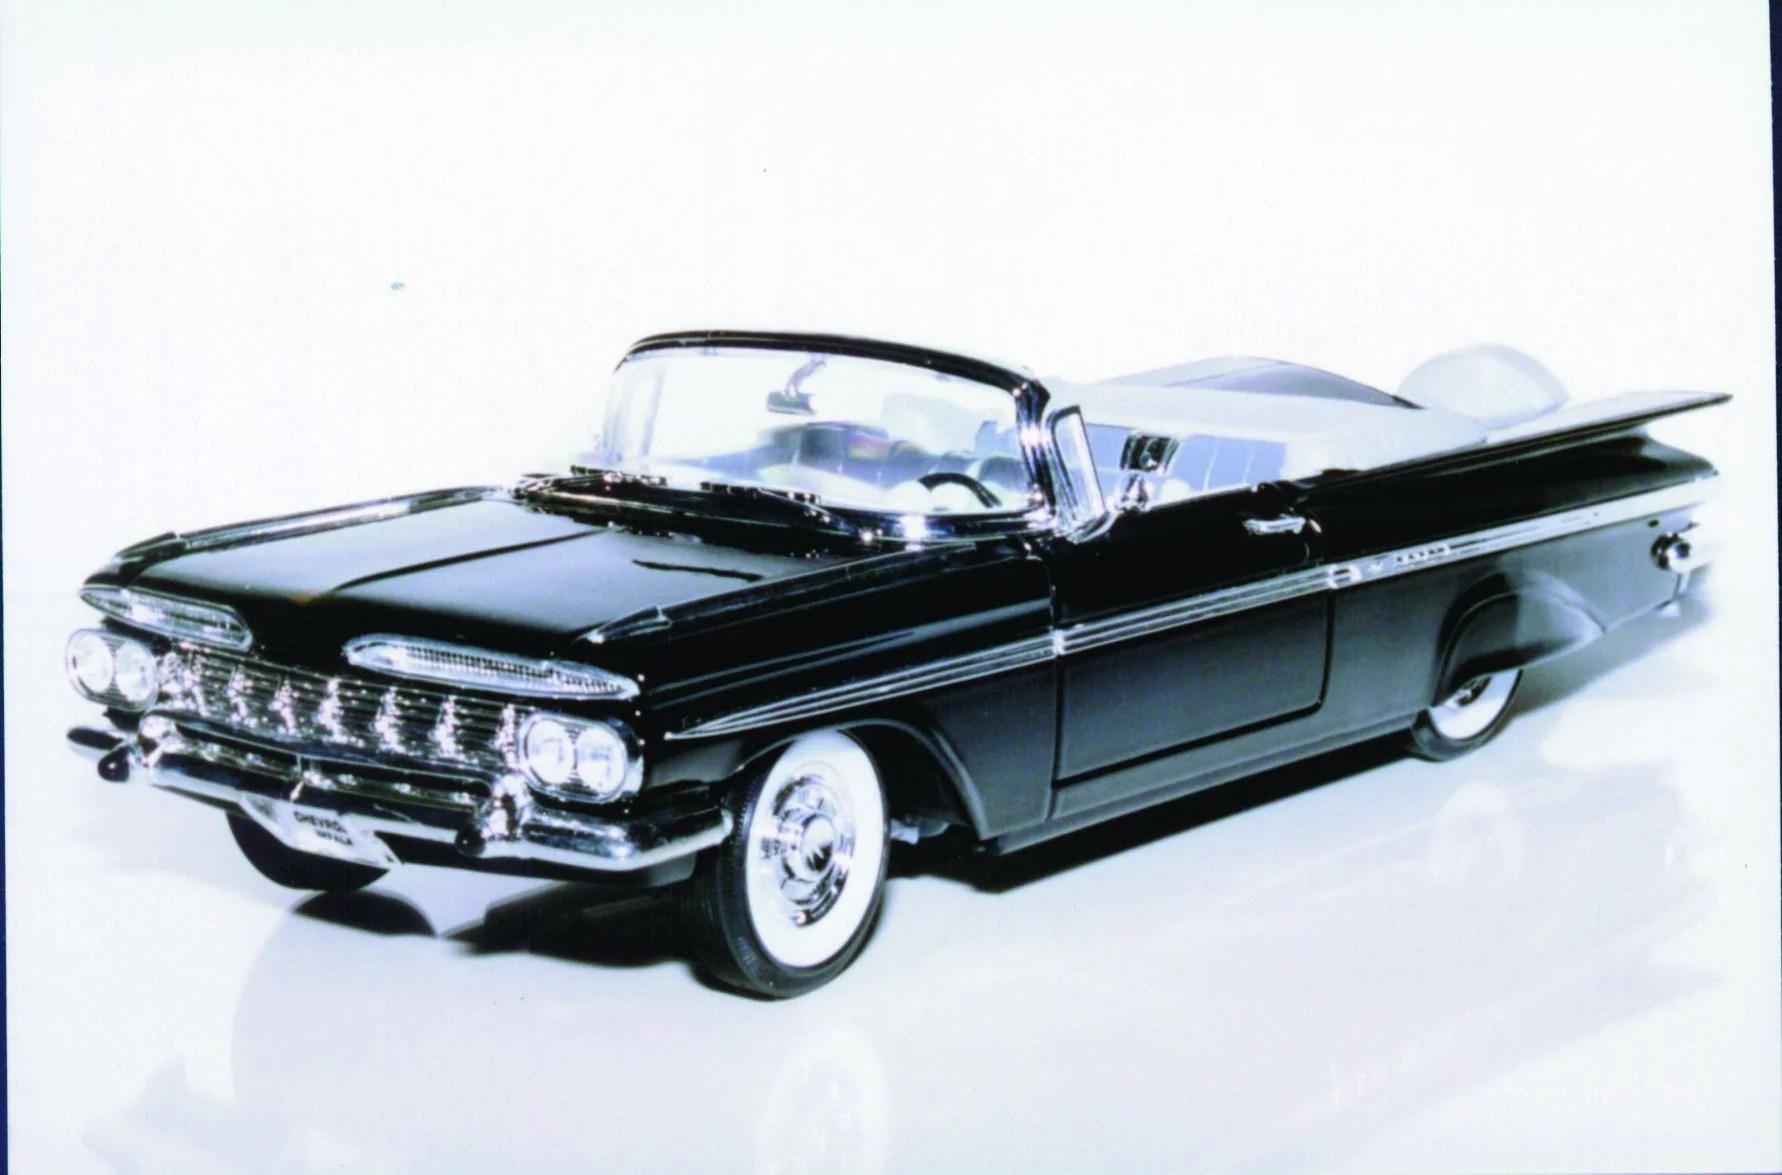 hight resolution of 1 18 yatming chevy impala 59 convertible